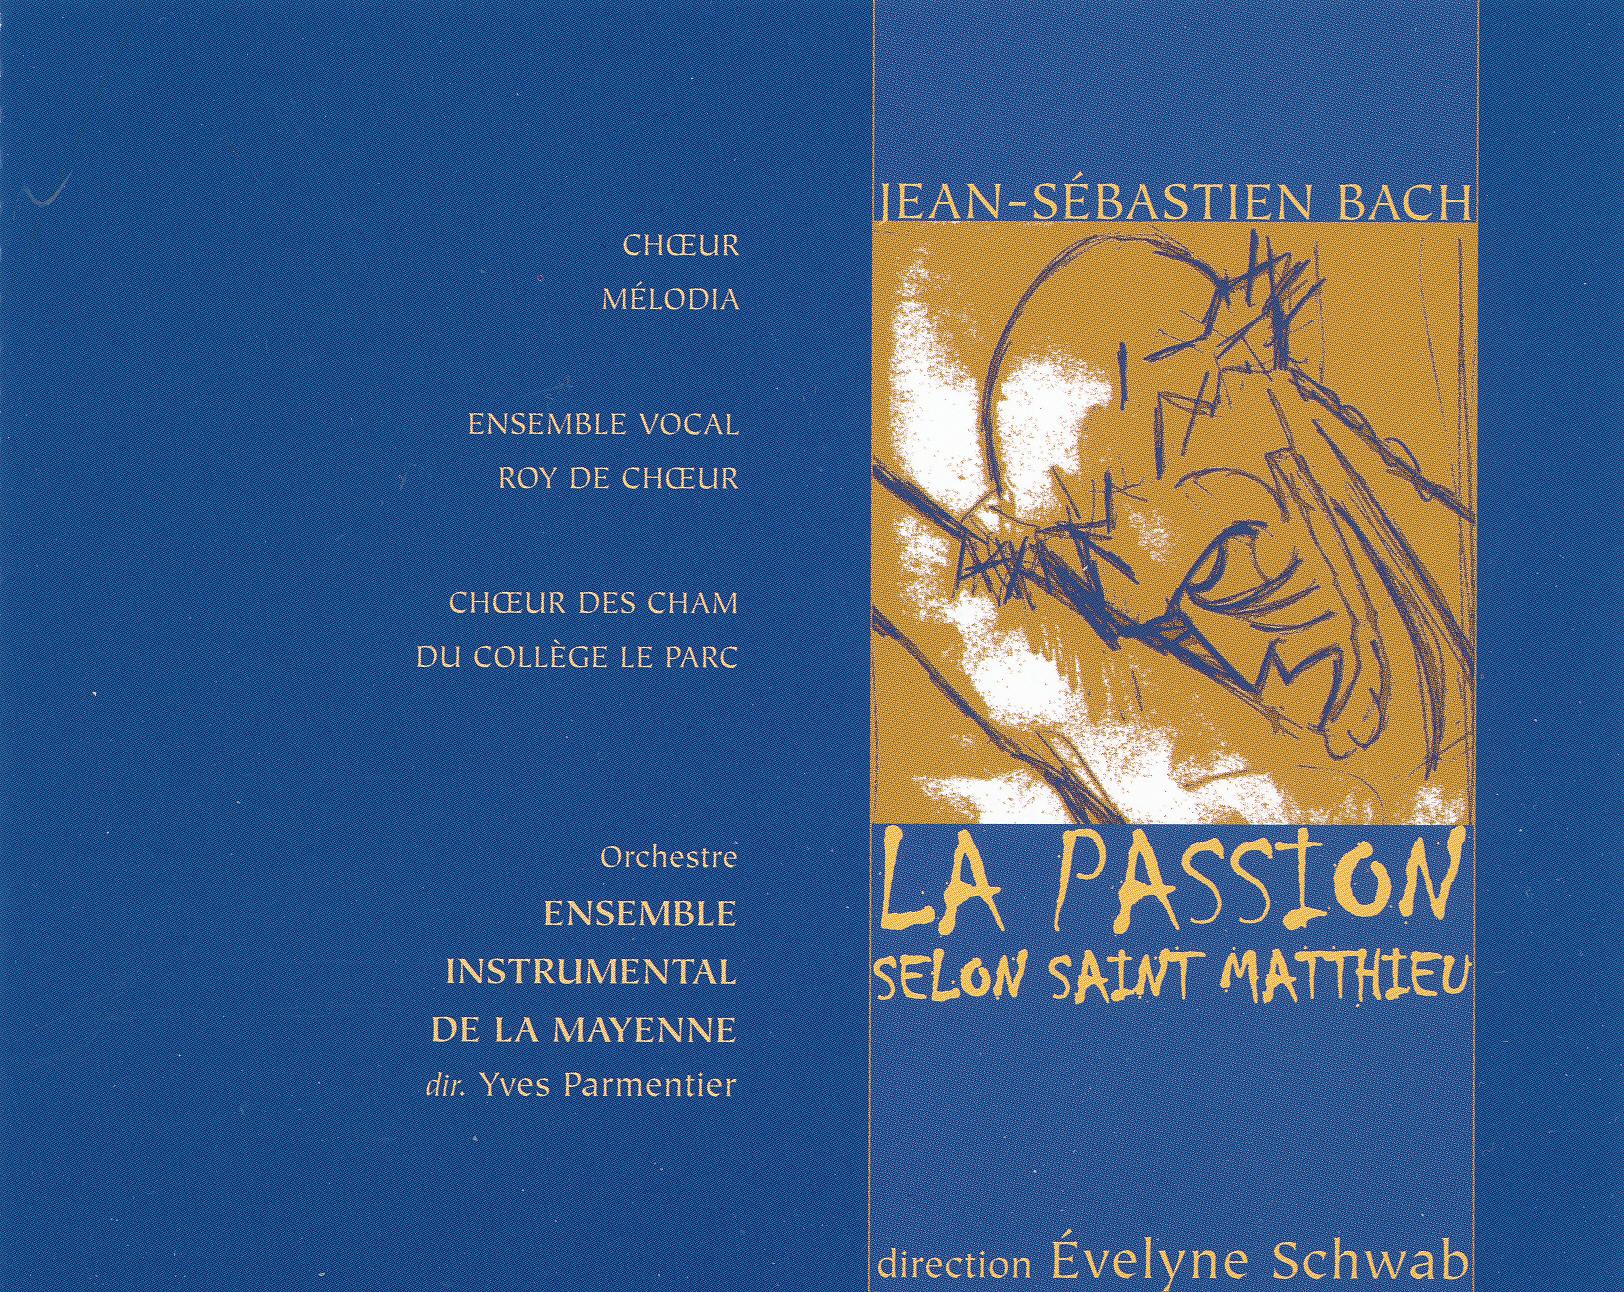 JS Bach - Passion selon St Matthieu